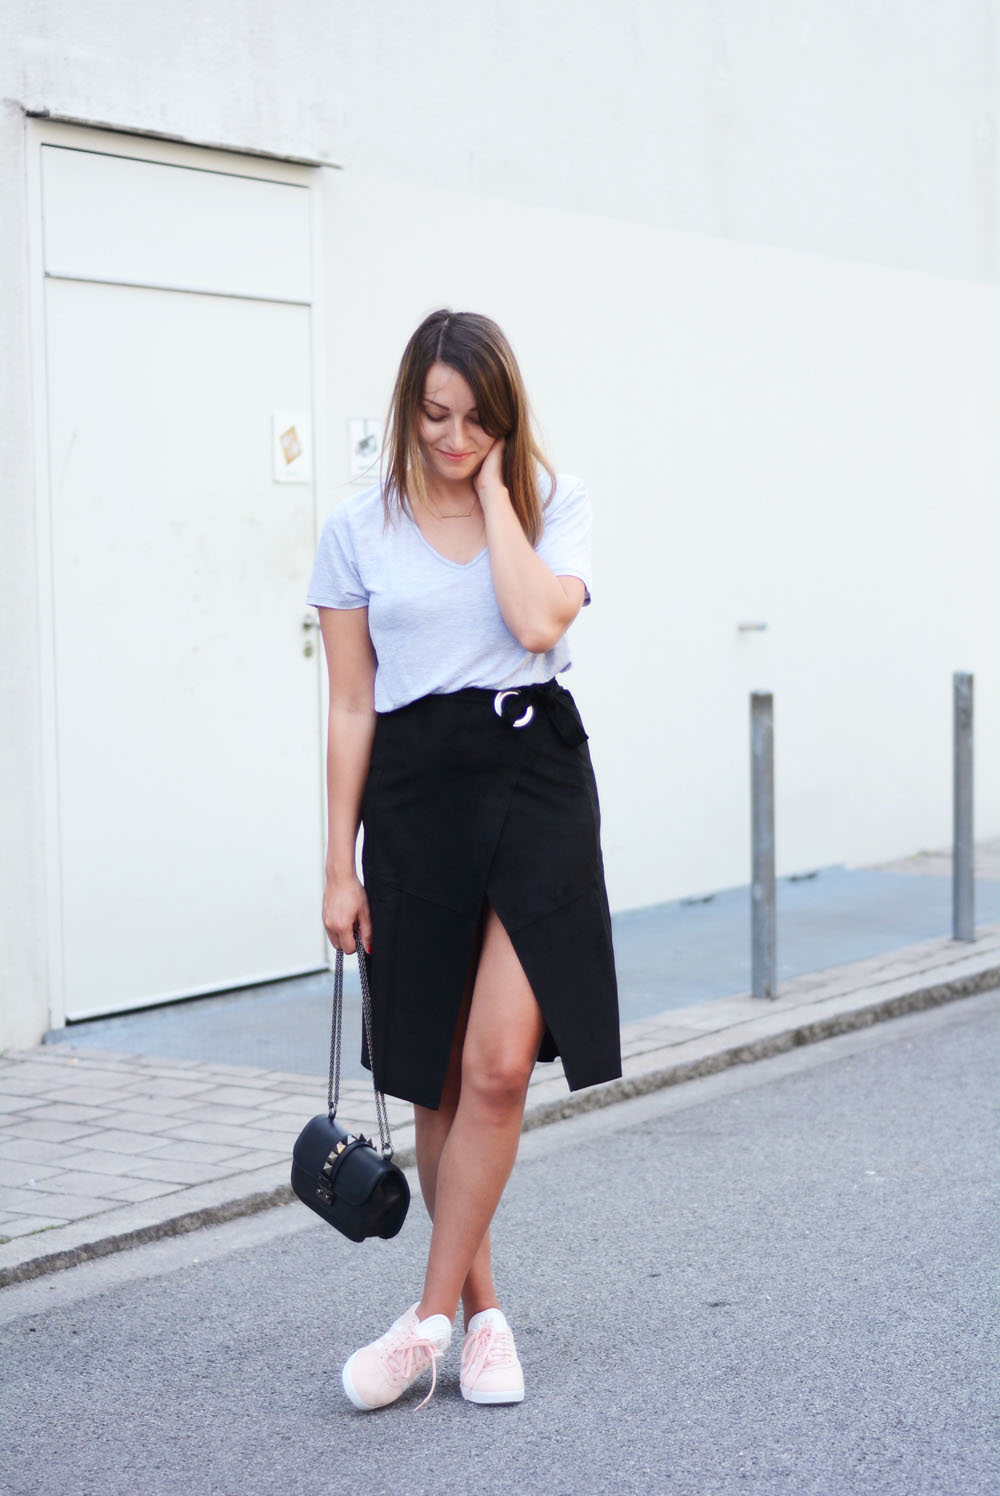 Adidas Gazelle Damen Outfit